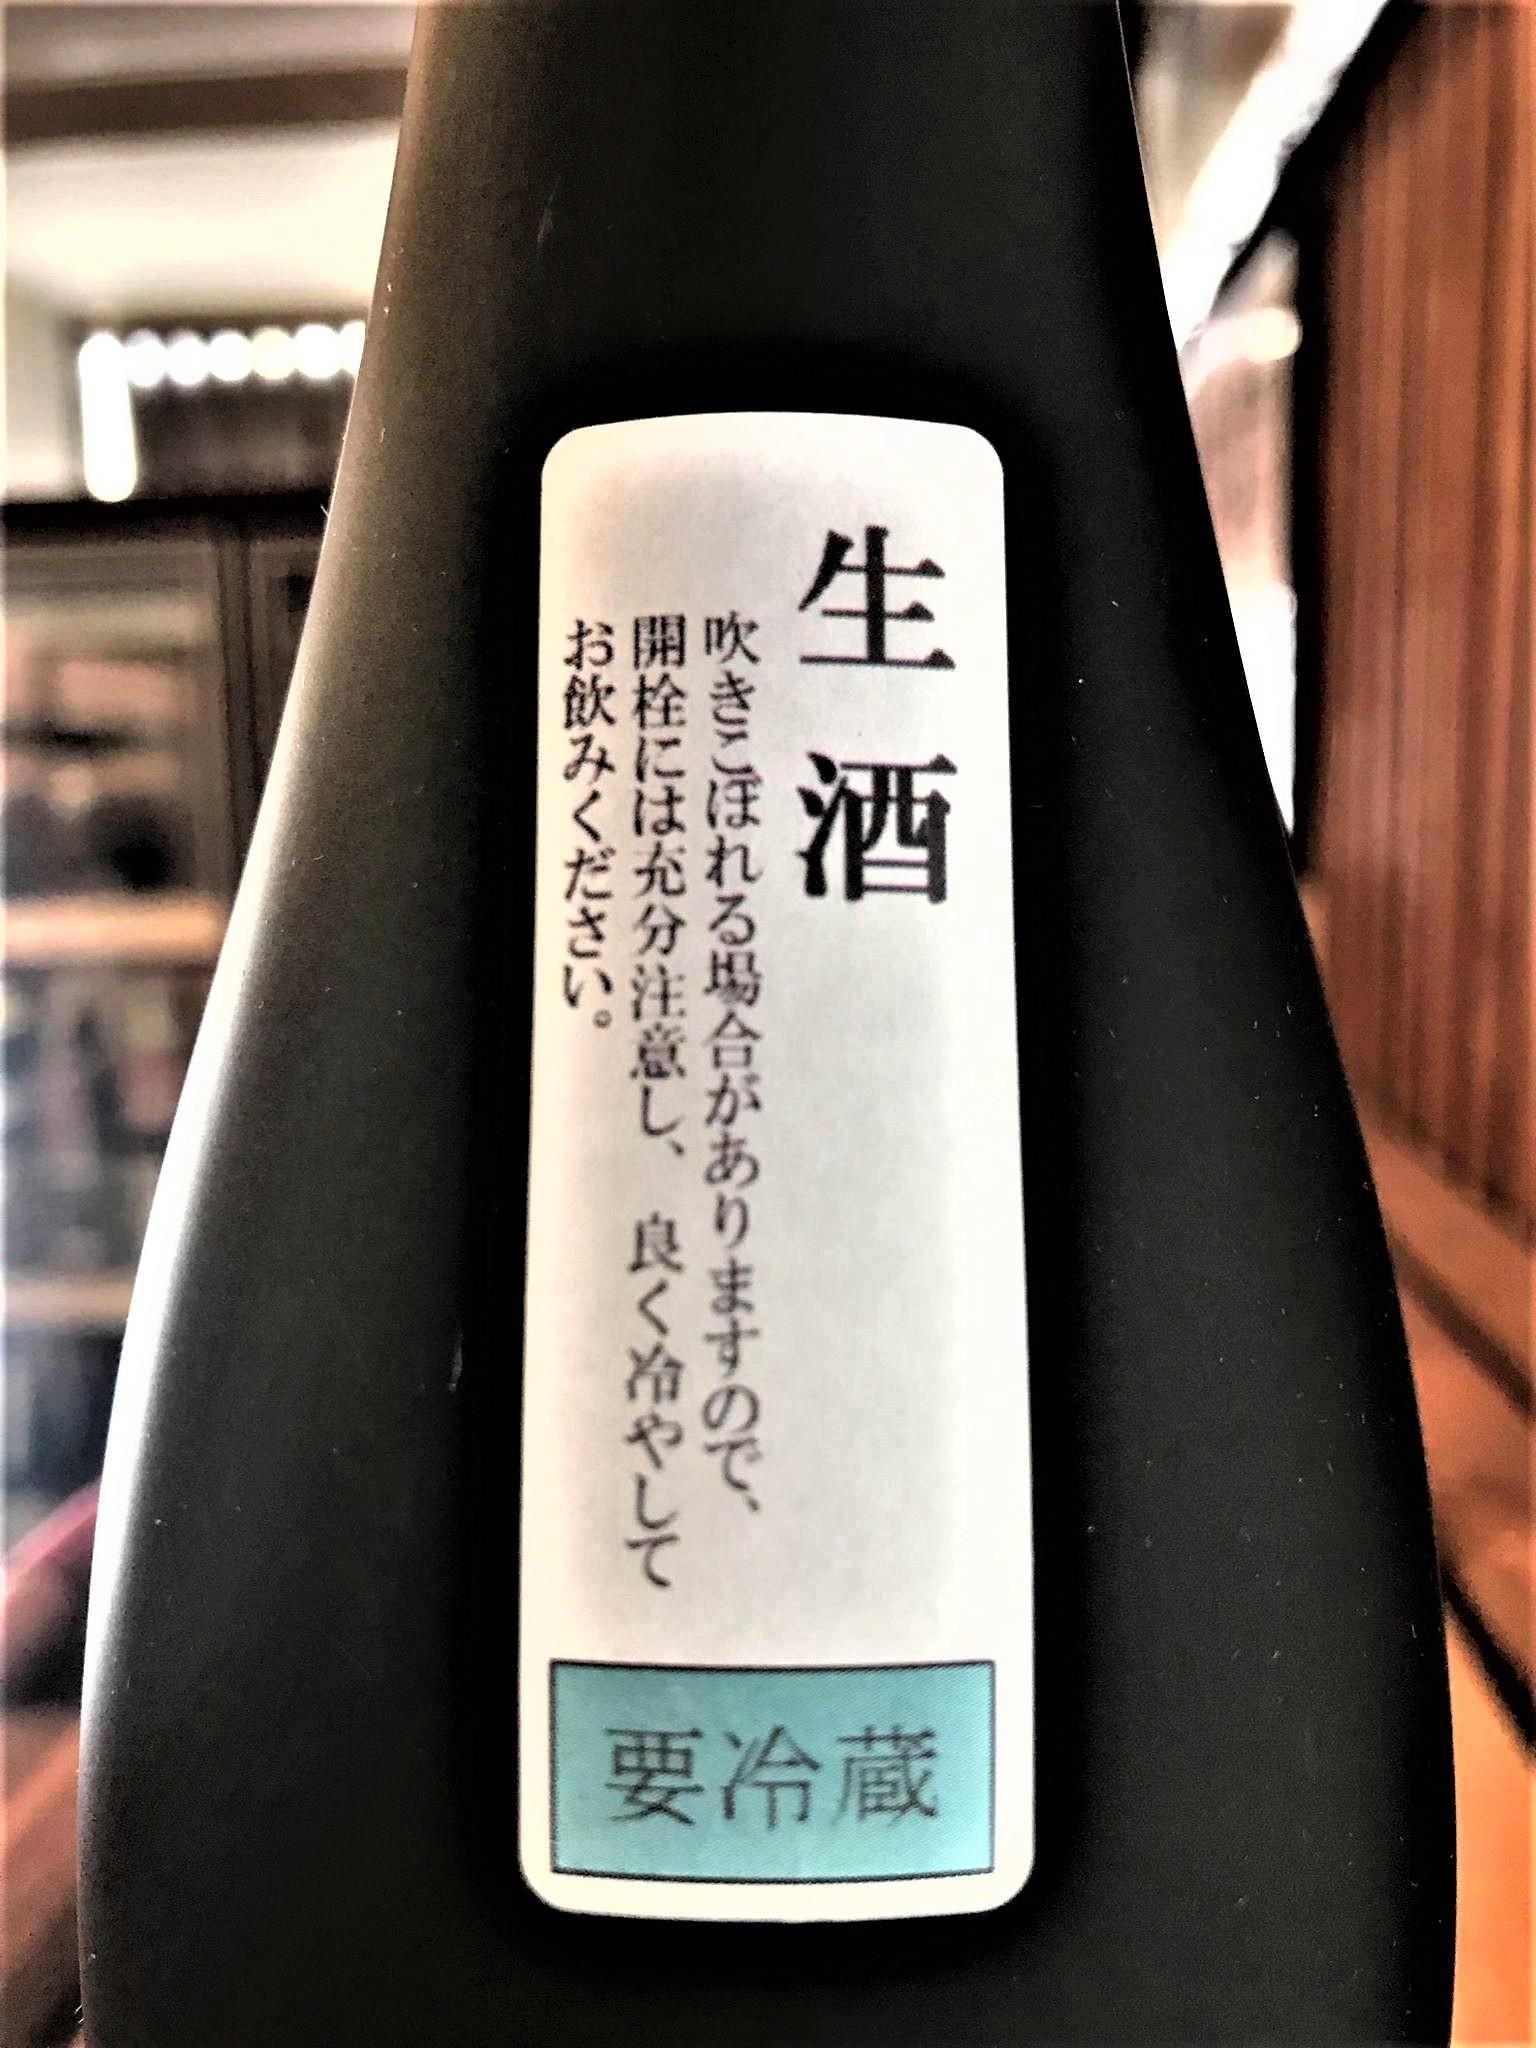 【日本酒】醸す森『kamosu mori』純米大吟醸生酒 五百万石50磨き 蔵元特別限定蔵出し 令和1BY🆕_e0173738_1874062.jpg